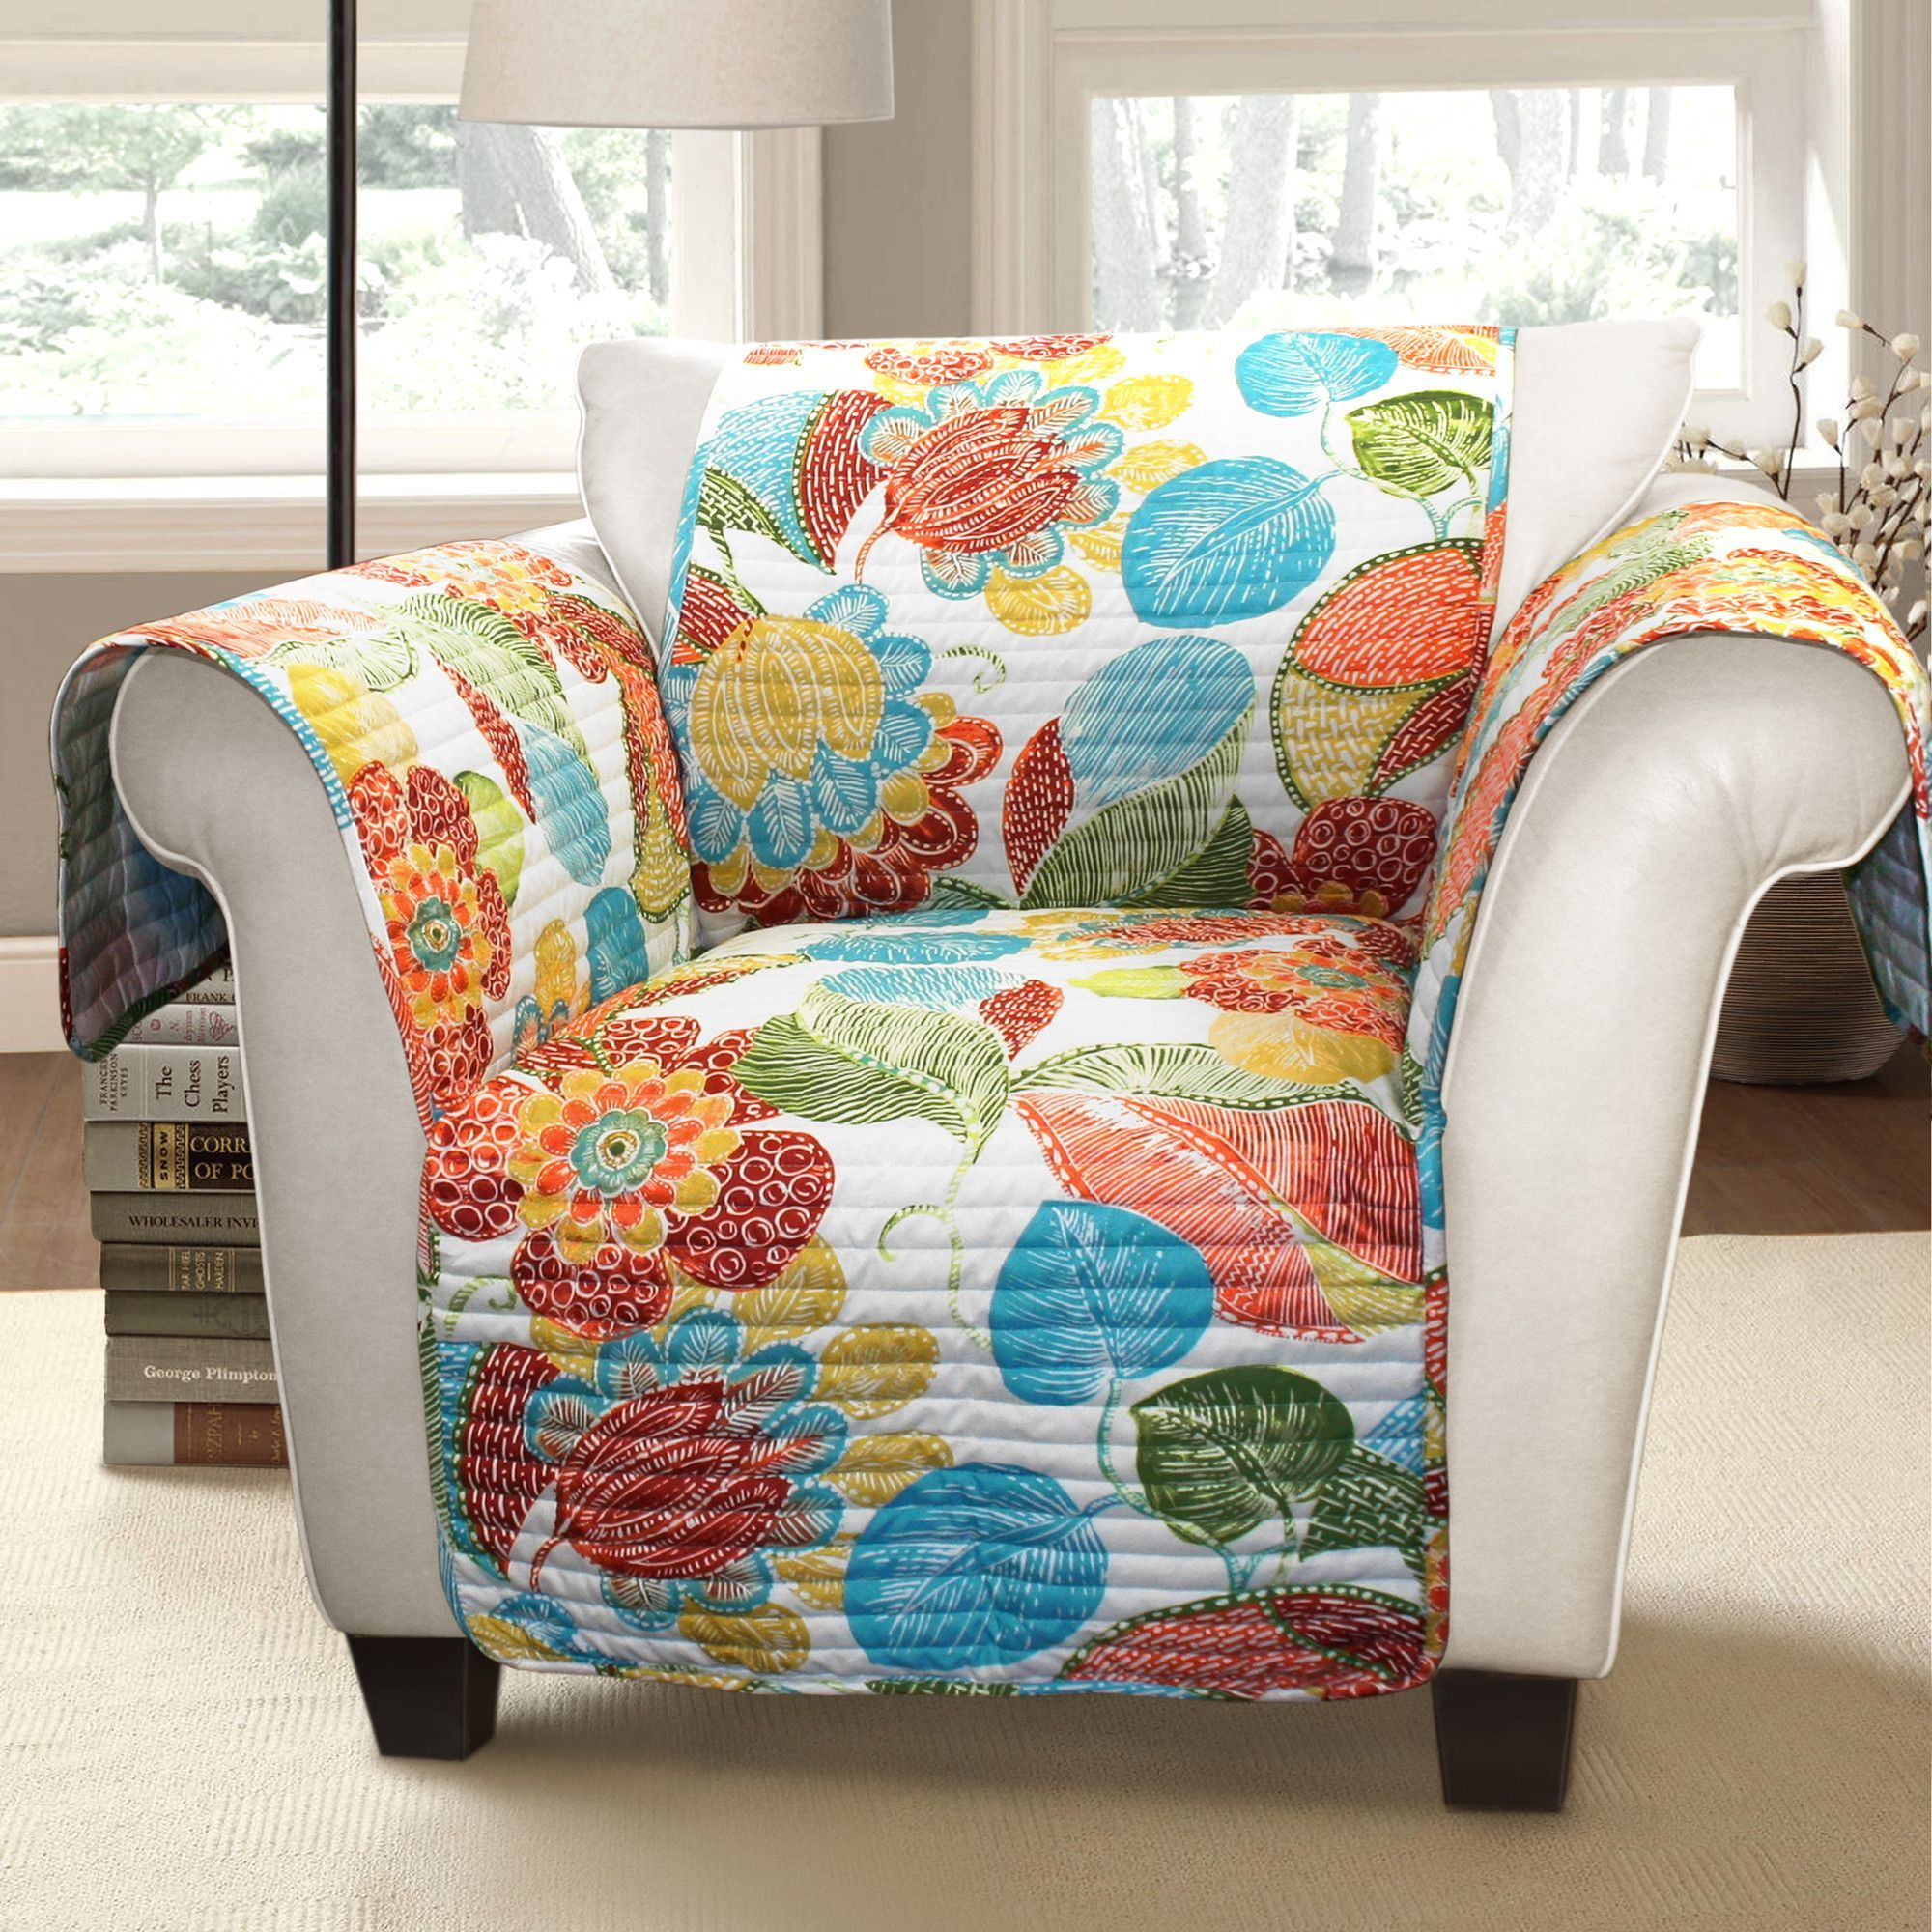 layla furniture protectors    blue armchairfuton     layla furniture protectors   products   pinterest   products